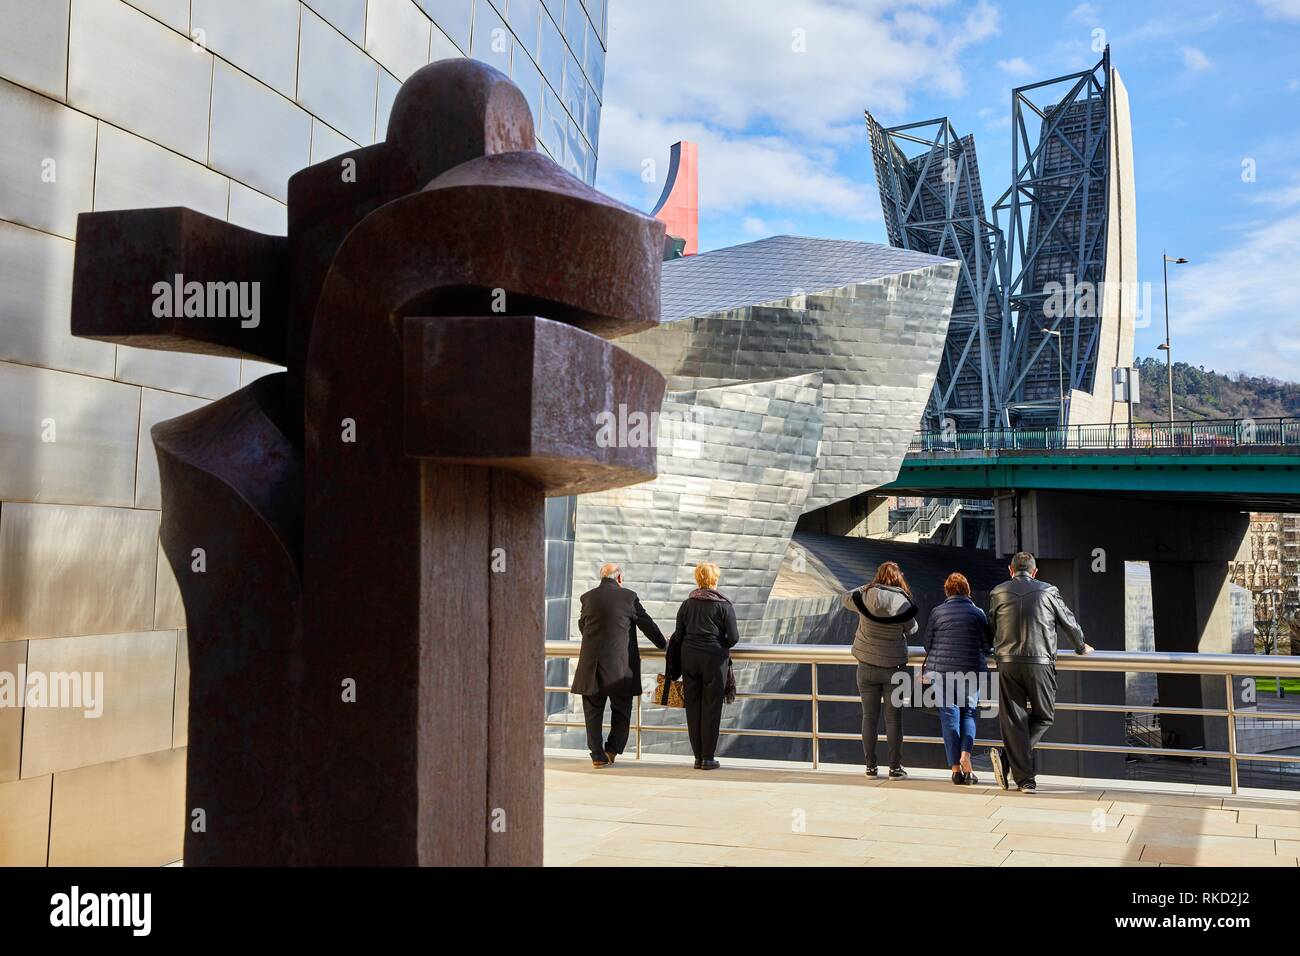 ´Embrace XI (Besarkada XI)´, 1996, Eduardo Chillida, Guggenheim Bilbao Museoa, Bilbao, Bizkaia, Basque Country, Spain, Europe Stock Photo